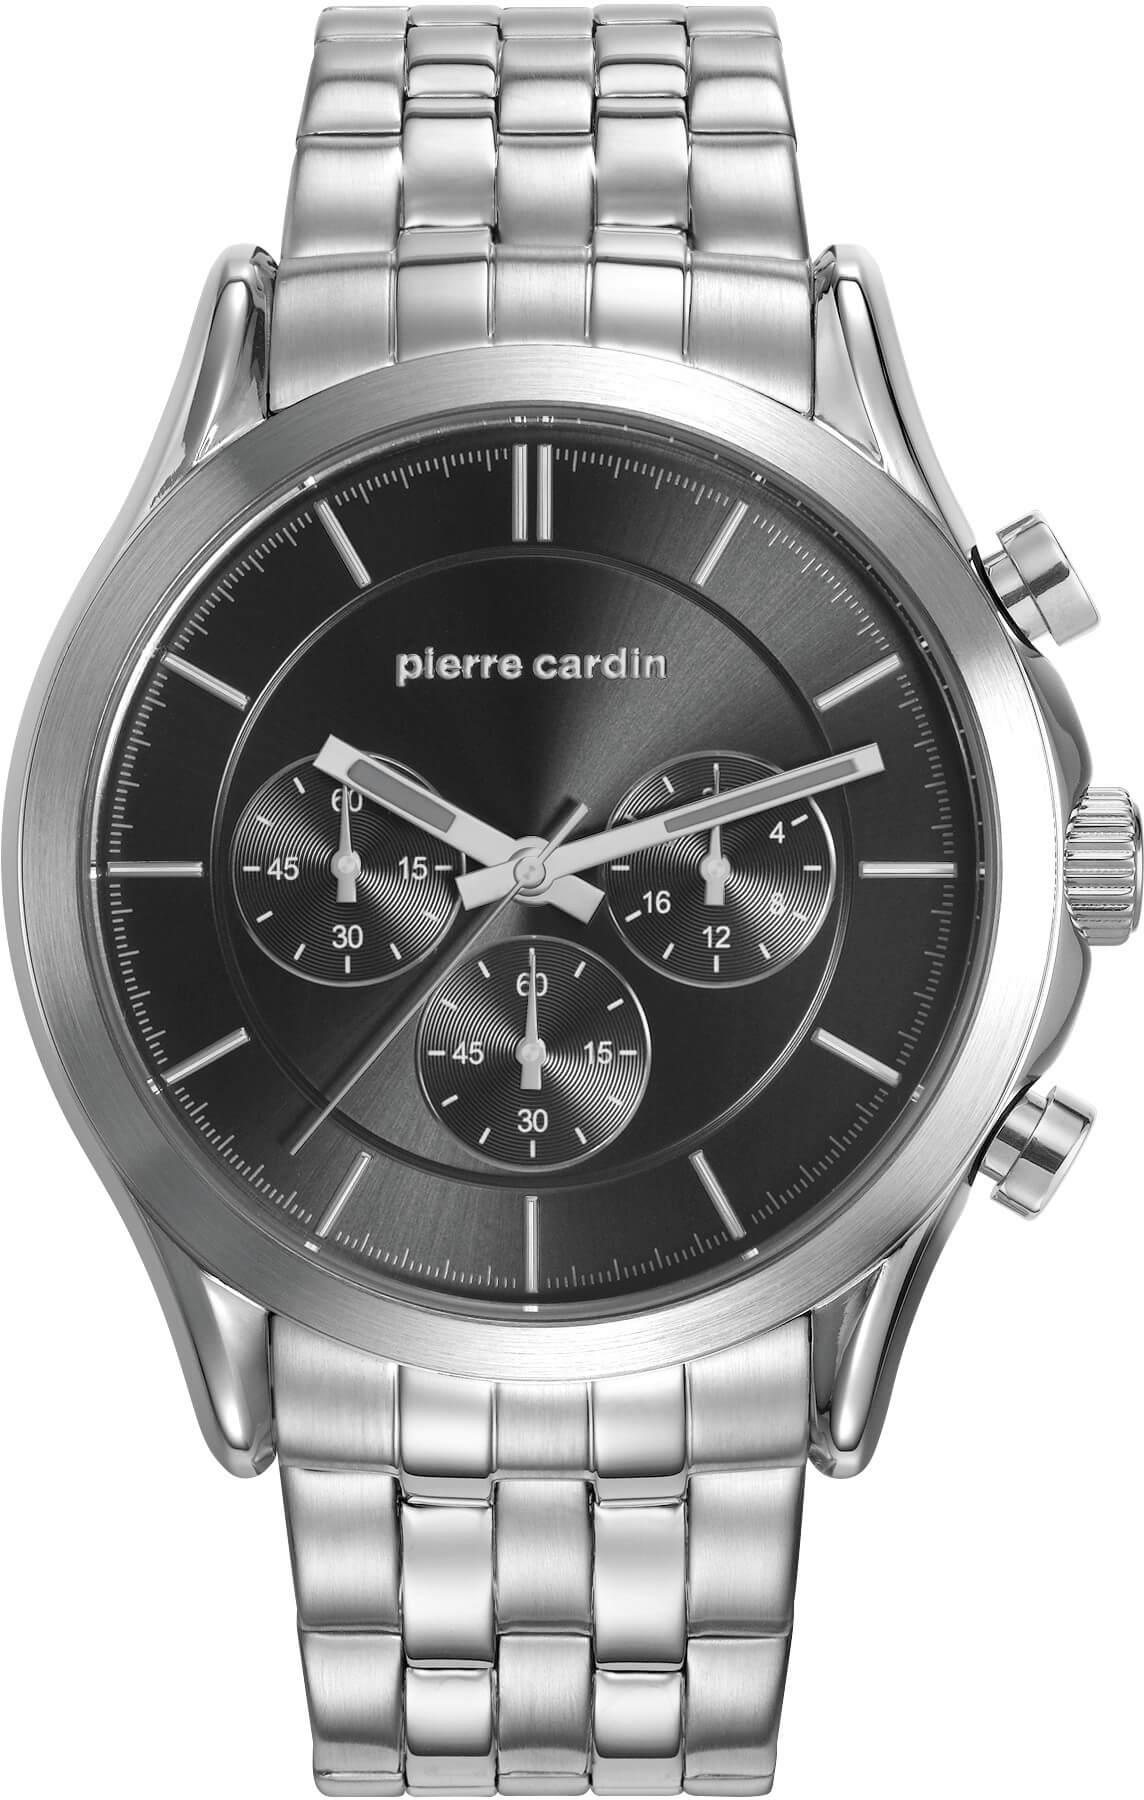 Pierre Cardin Botzaris PC107201F05 Doprava ZDARMA  7caa8866ac2